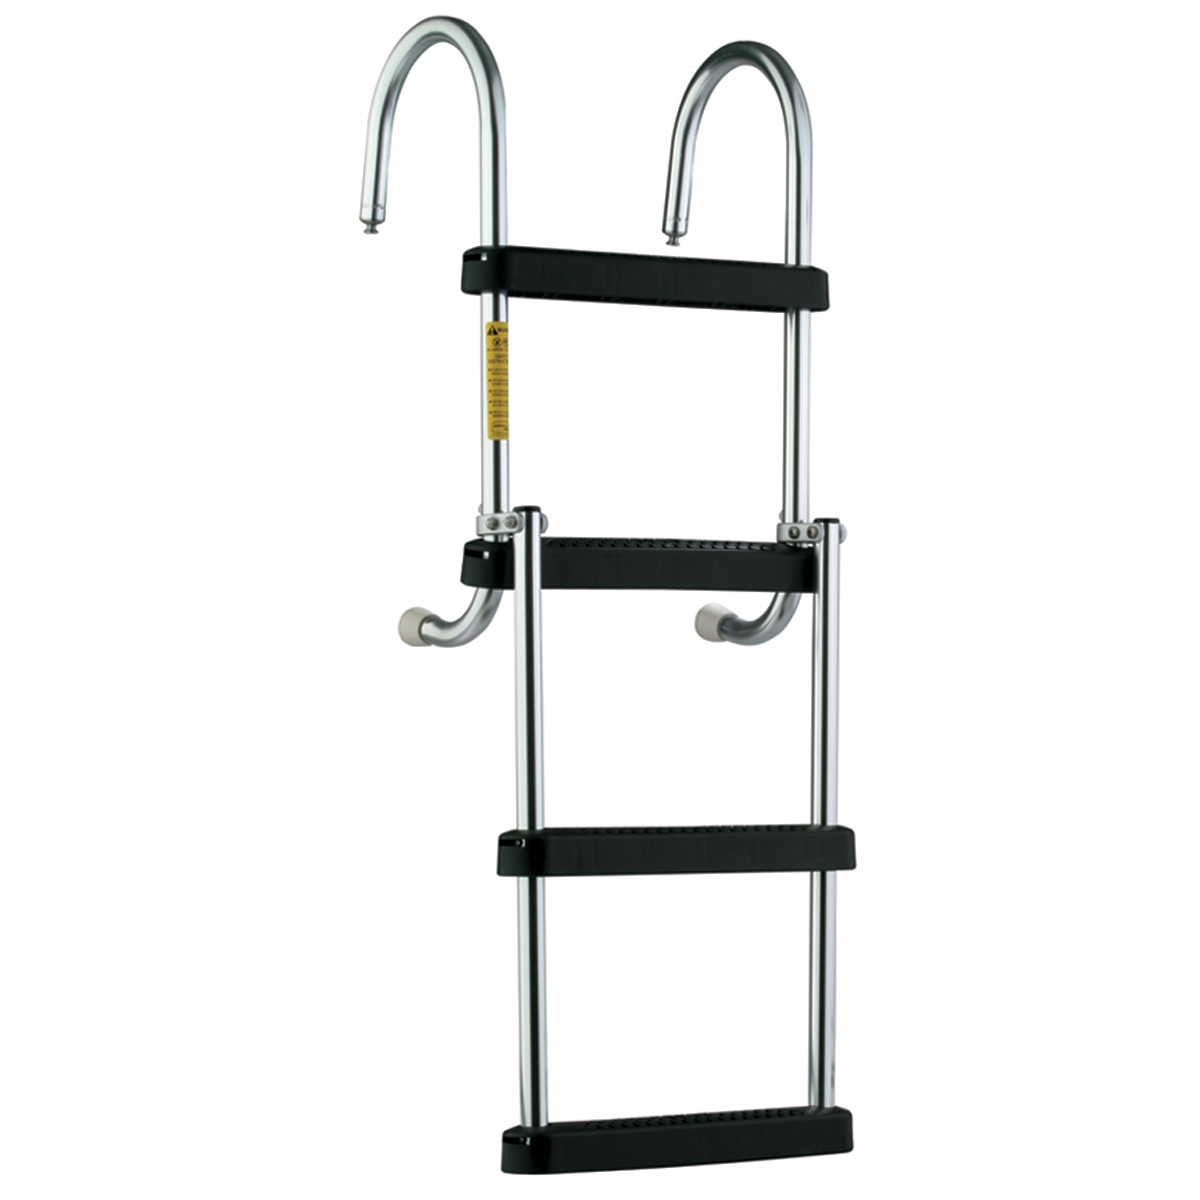 Boarding Ladders, Steps -AMPAND- Swim Platforms